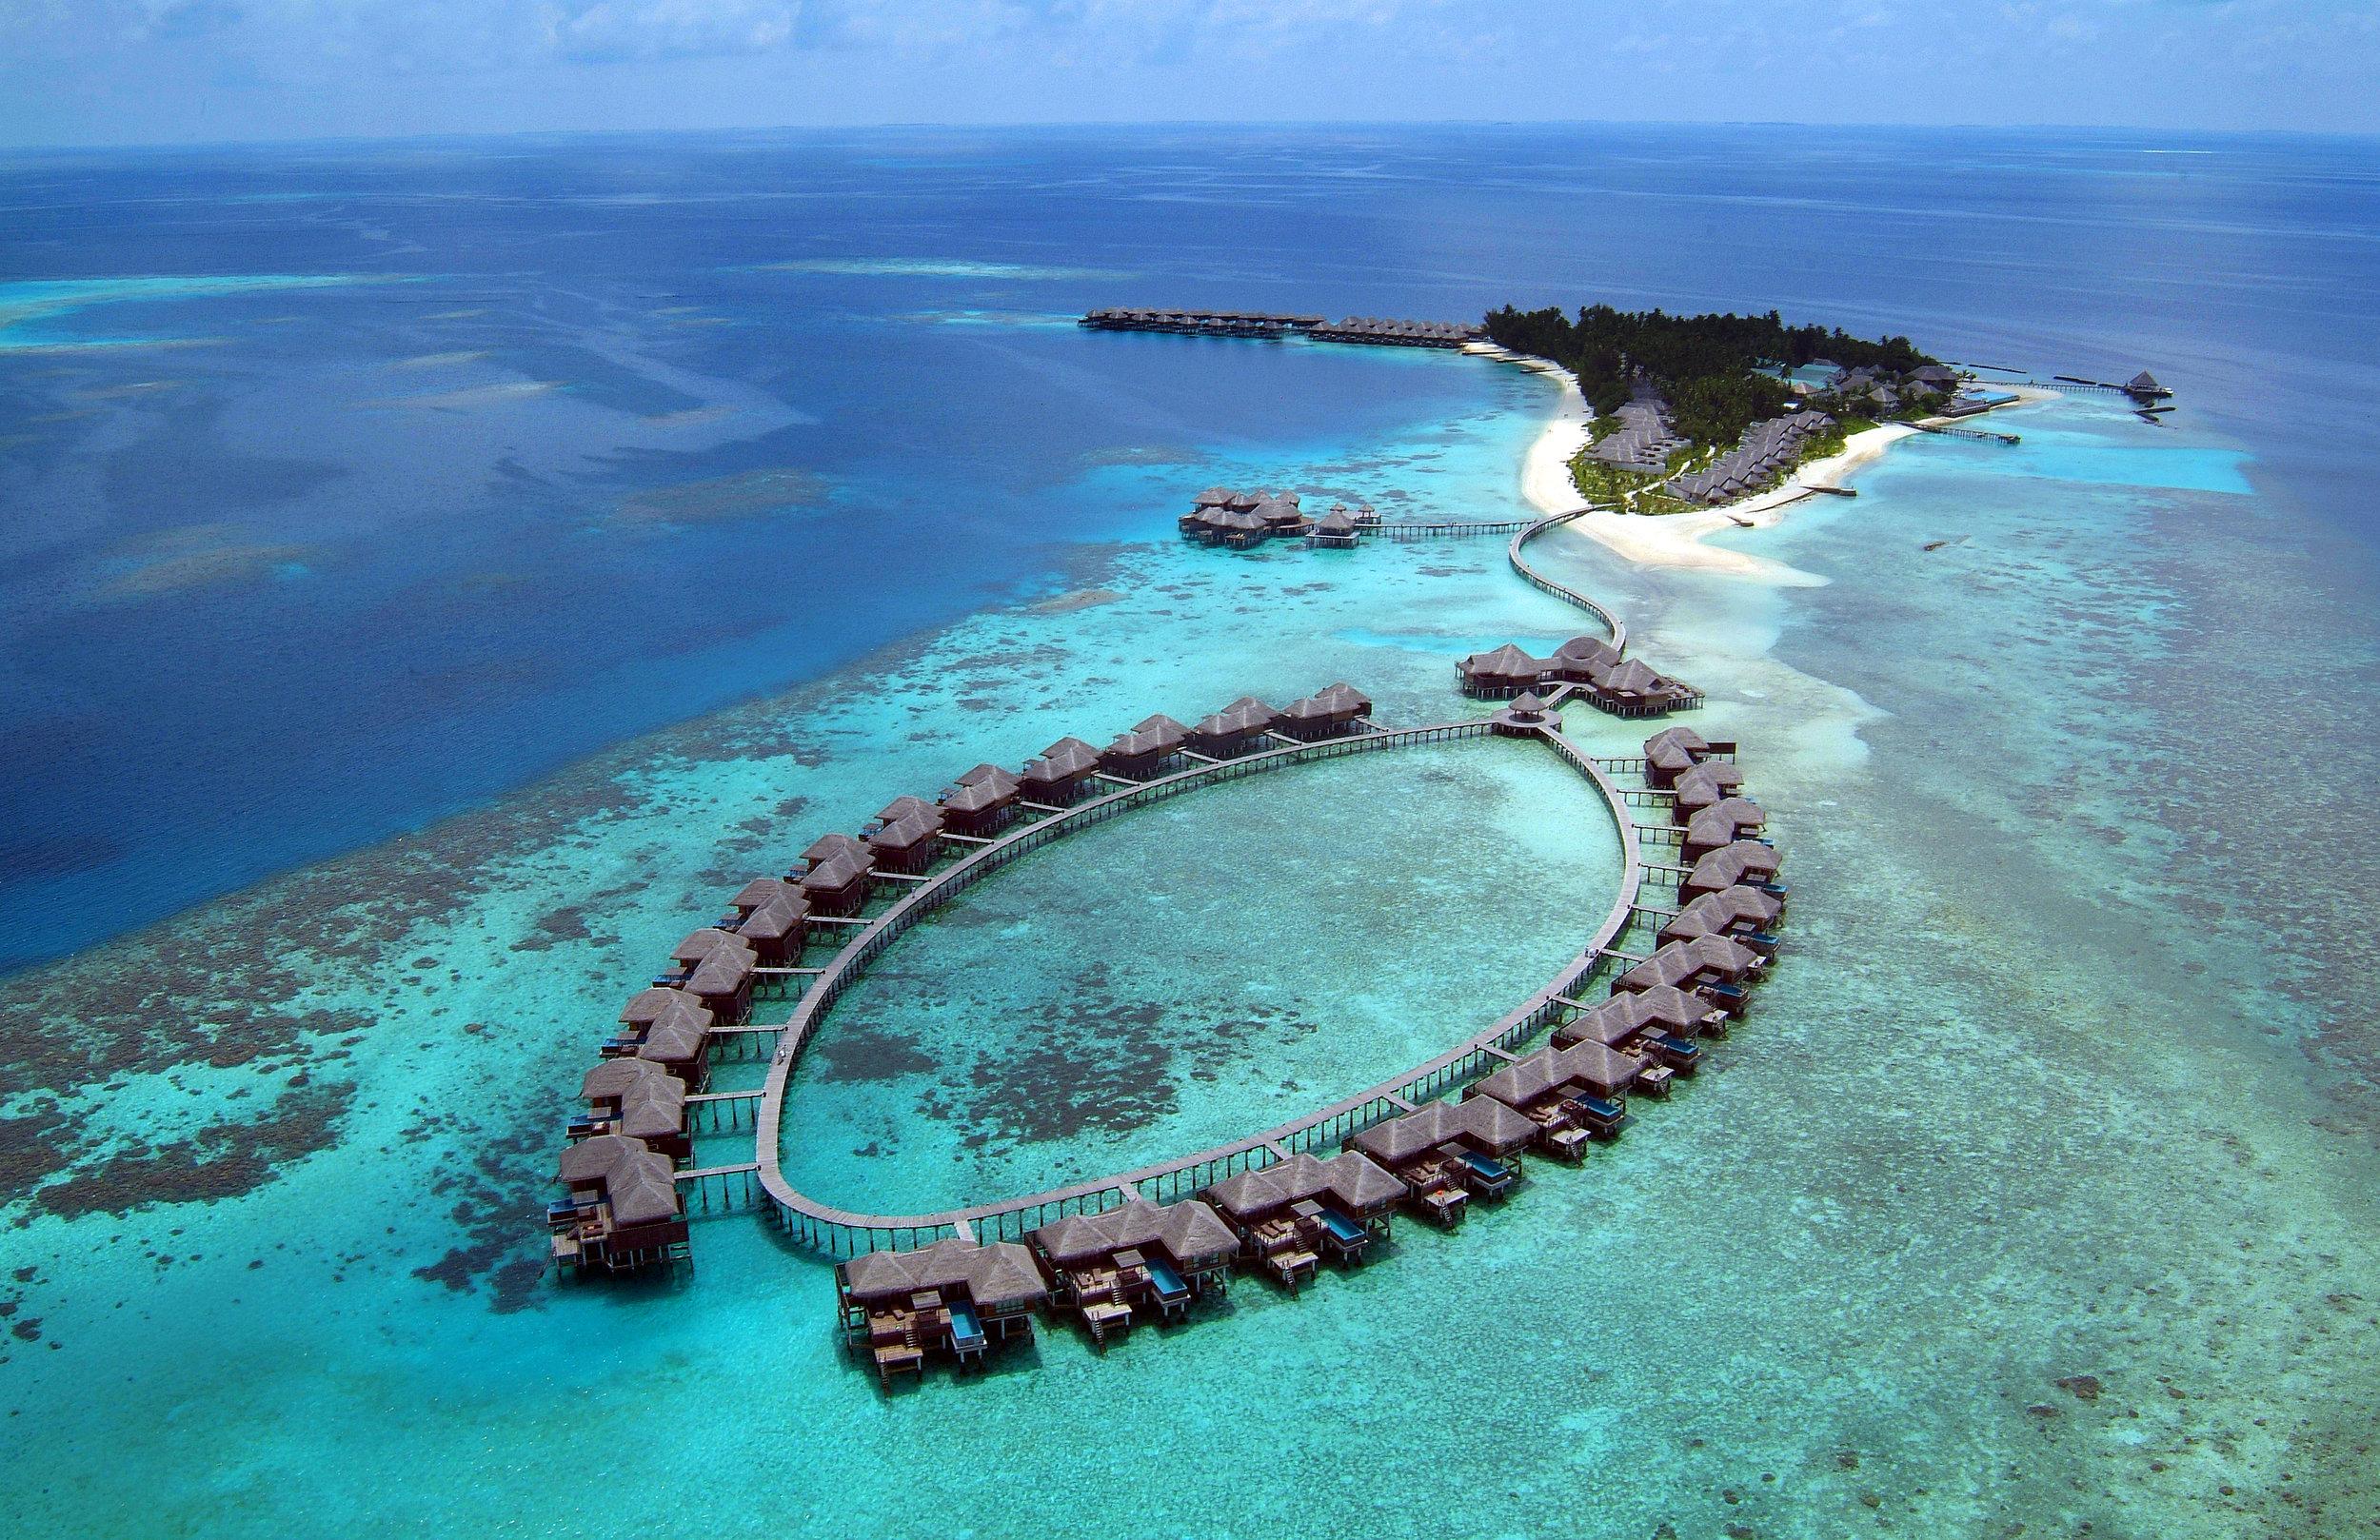 COCO BODU HITHI   Maldives    Images / Fact sheet / Video